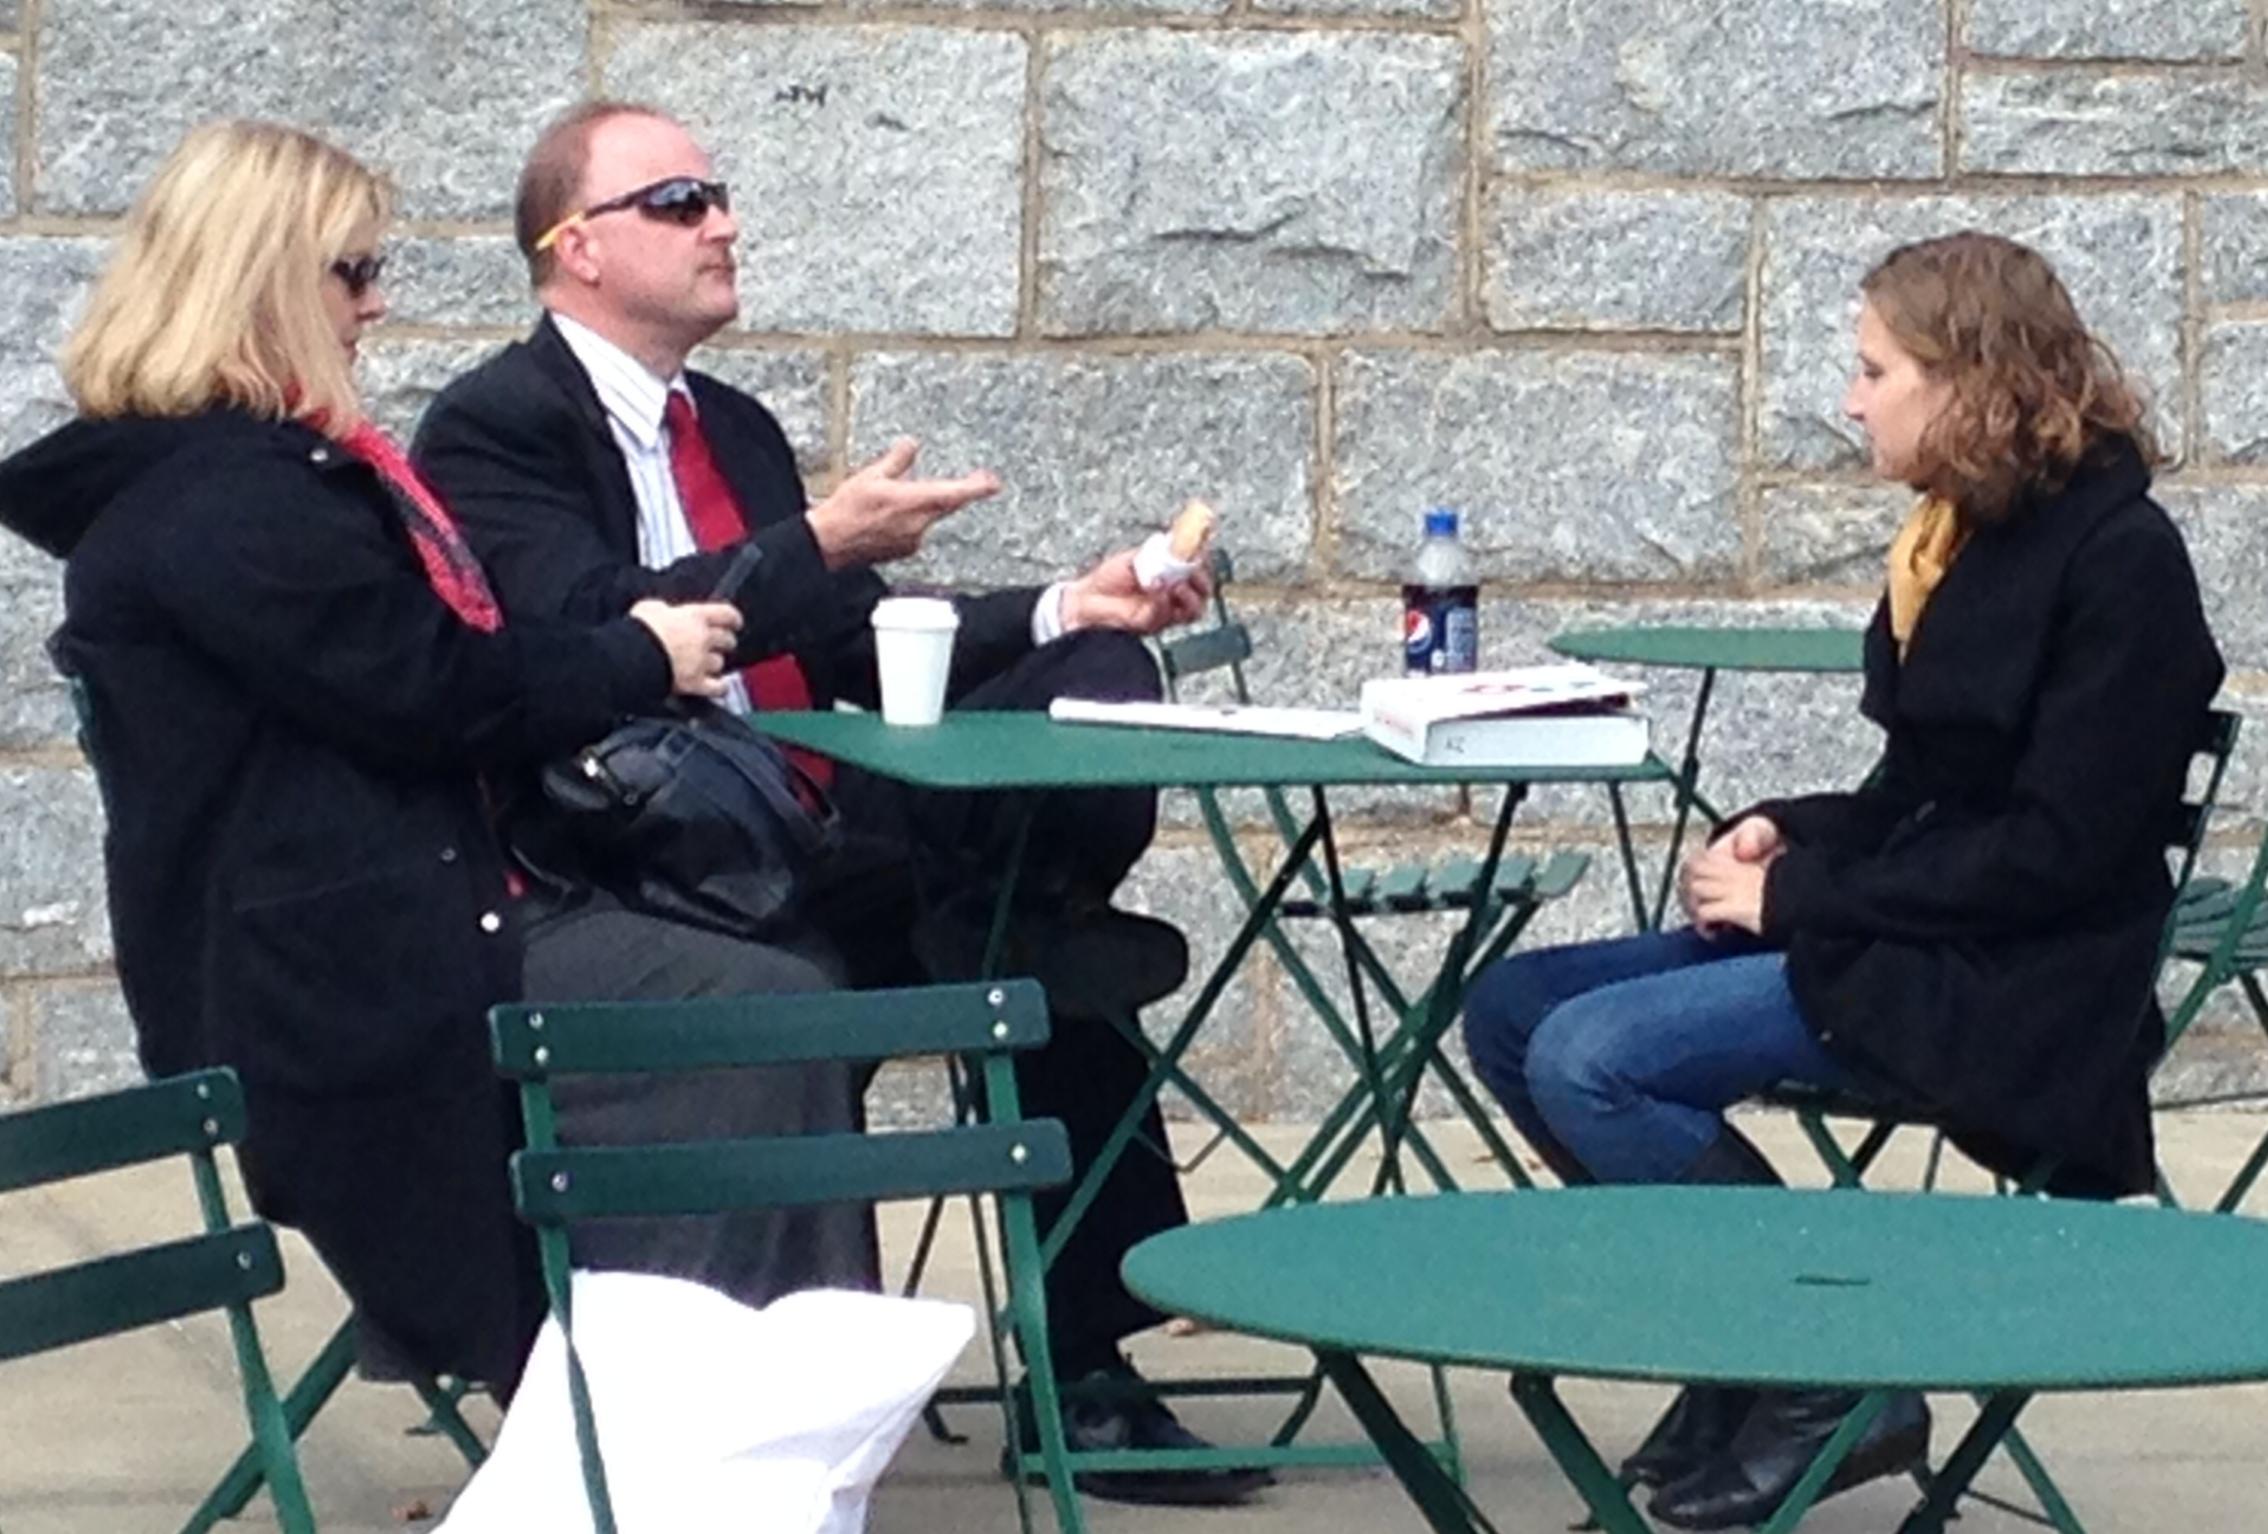 Senior Kelly Watson catches up with Professor Gunkel and Professor Dalton